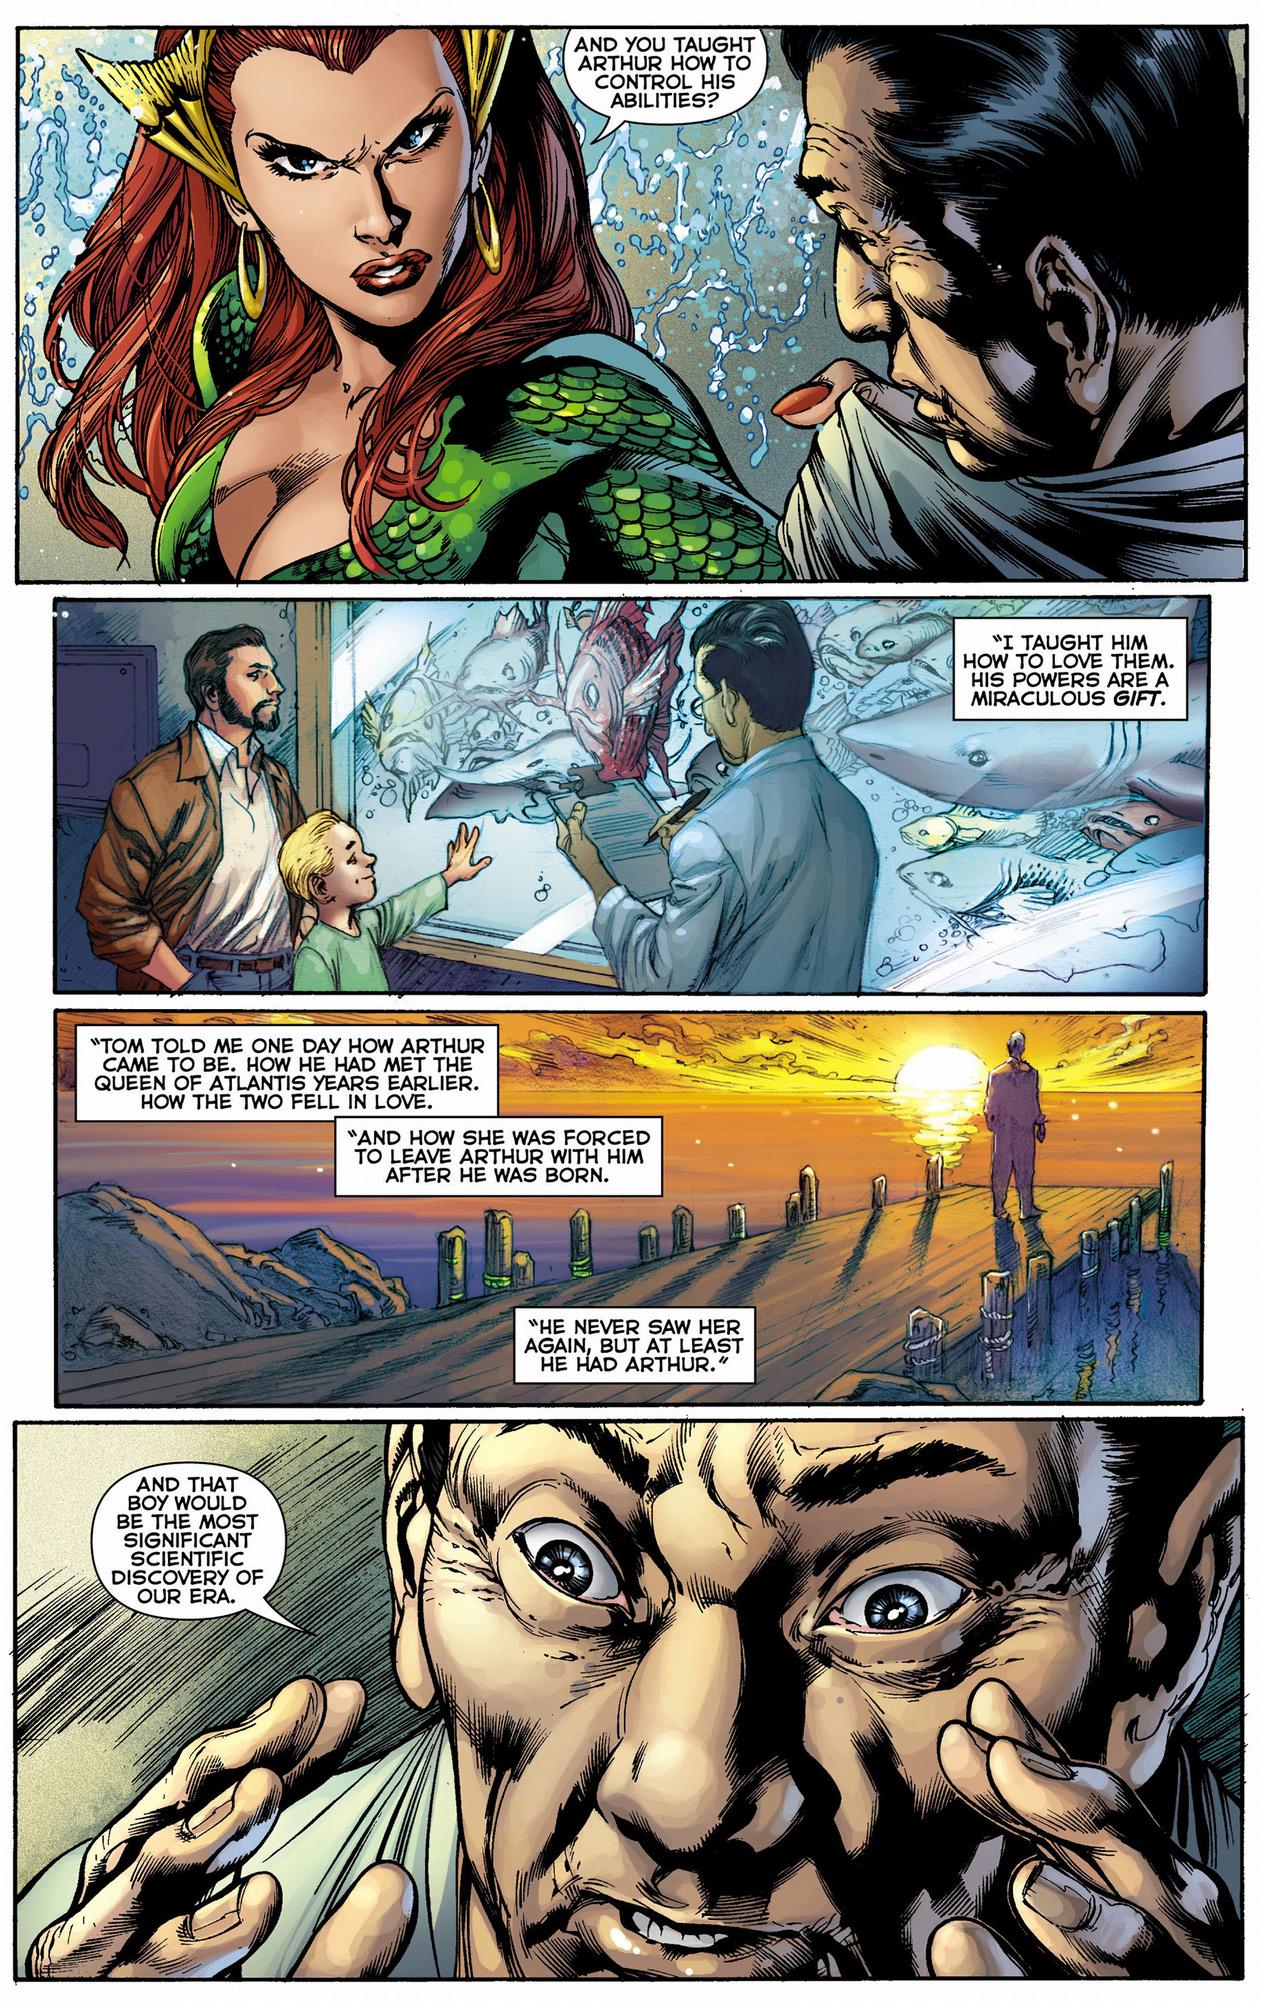 doctor shin's history with aquaman